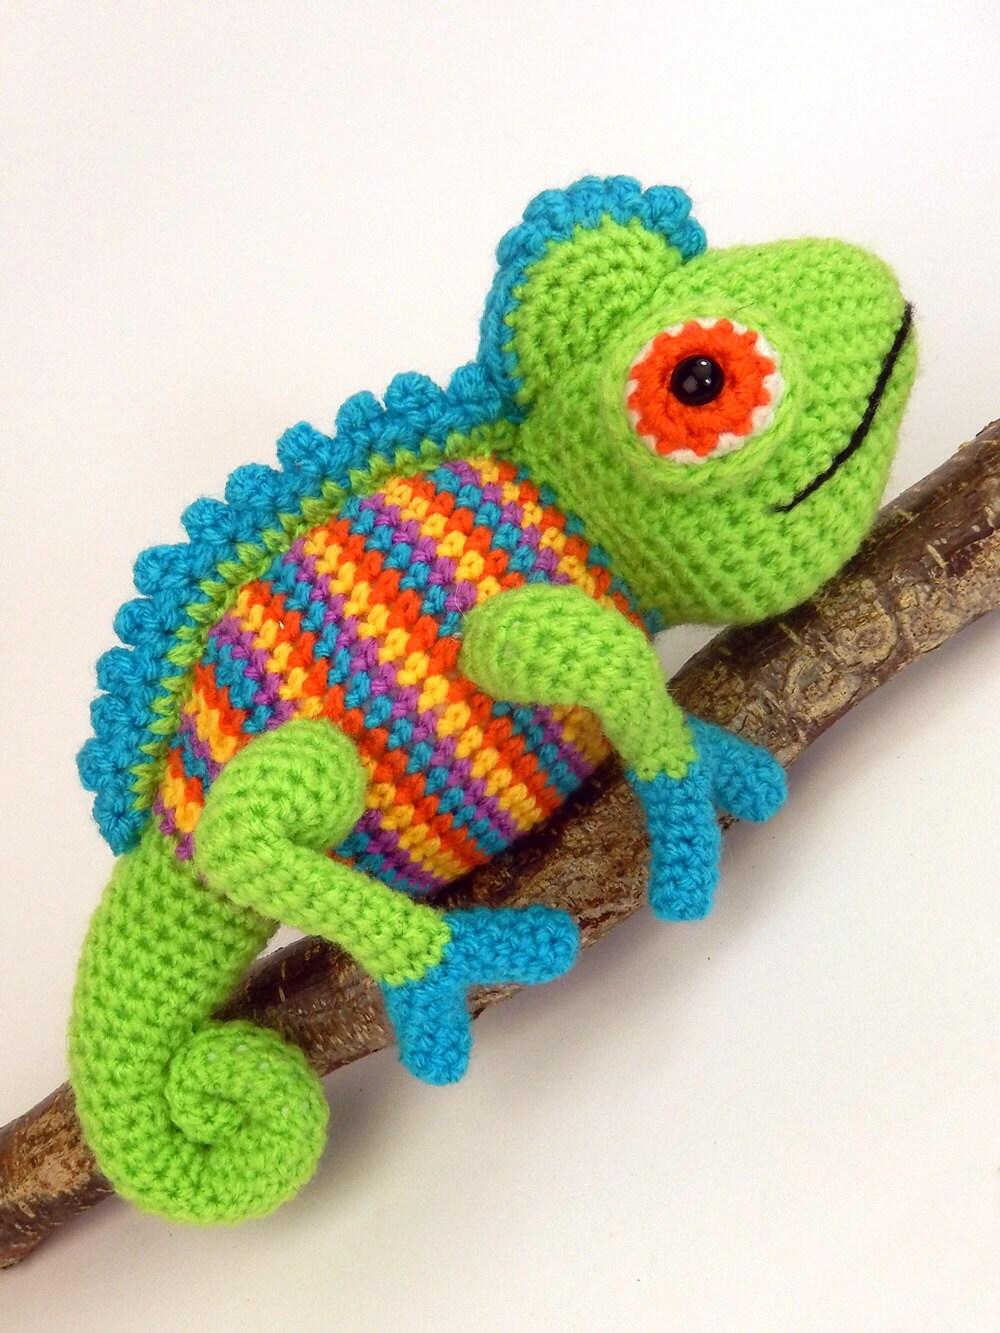 Camelia the Chameleon - Amigurumi Crochet Pattern from ...